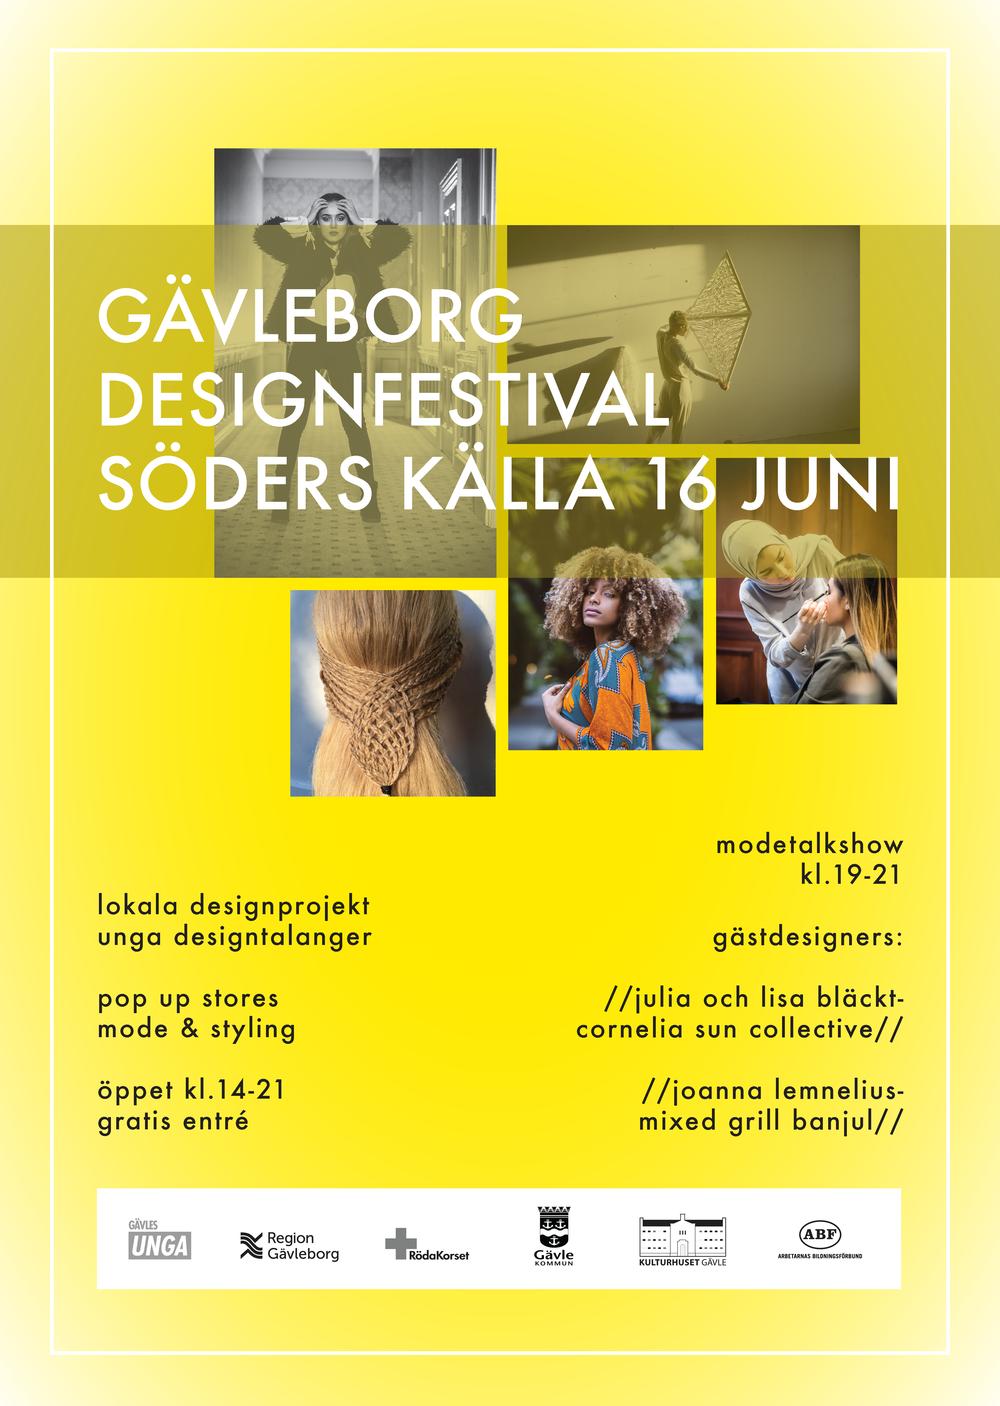 gavleborg_designfestival_ny.png